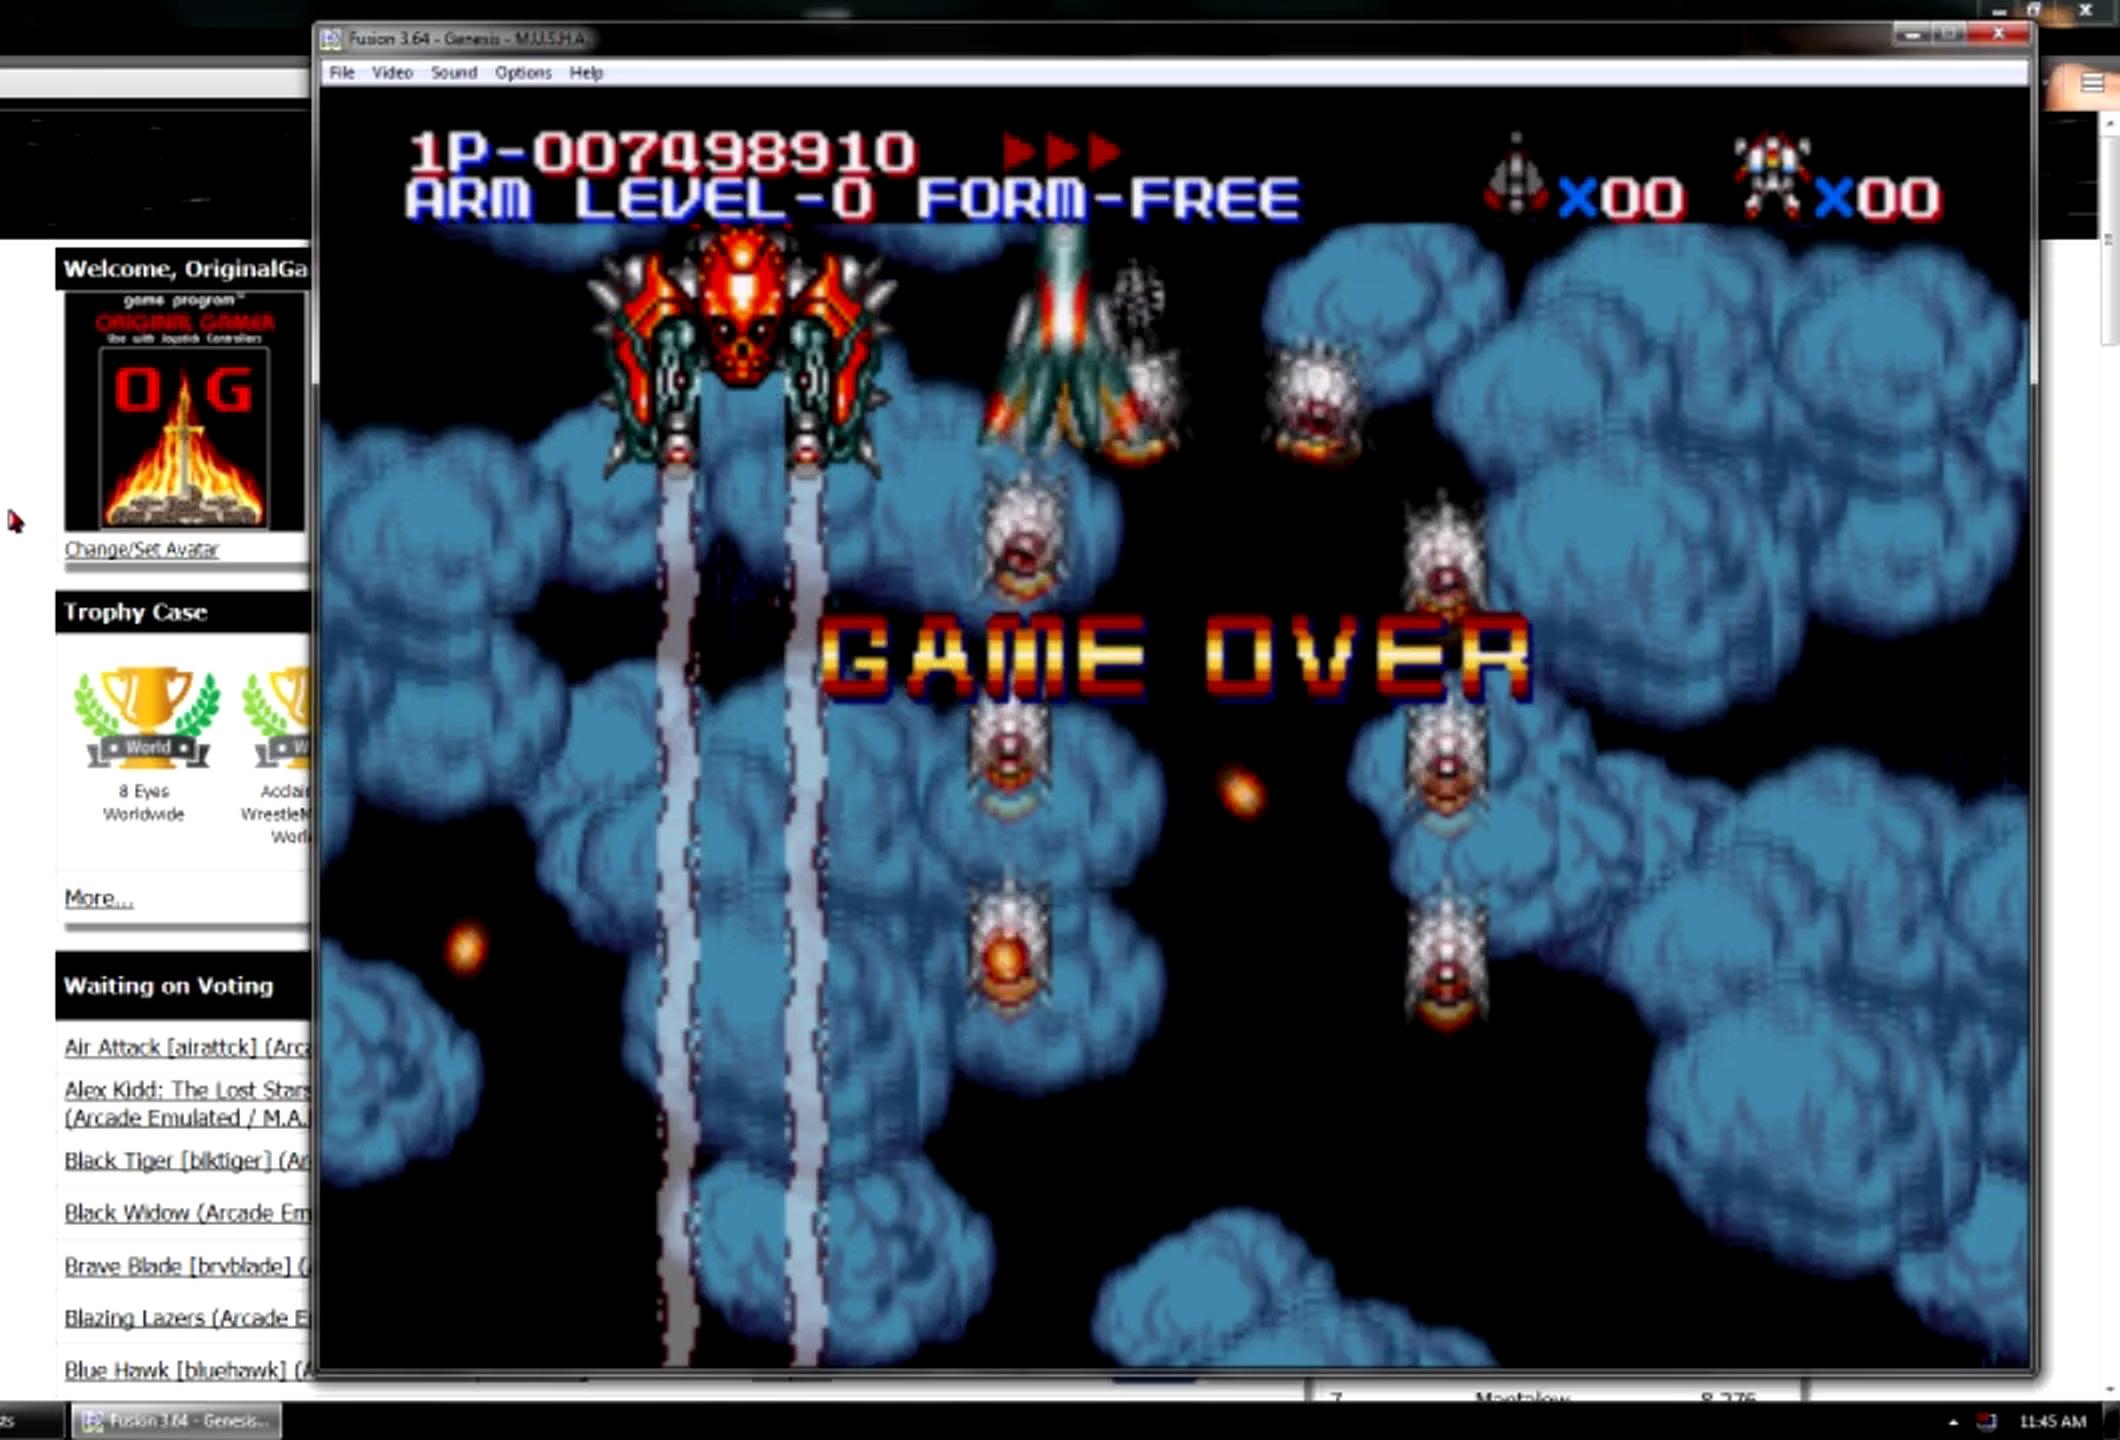 OriginalGamer: MUSHA: Metallic Uniframe Super Hybrid Armor [Normal] (Sega Genesis / MegaDrive Emulated) 7,498,910 points on 2015-06-20 18:04:43